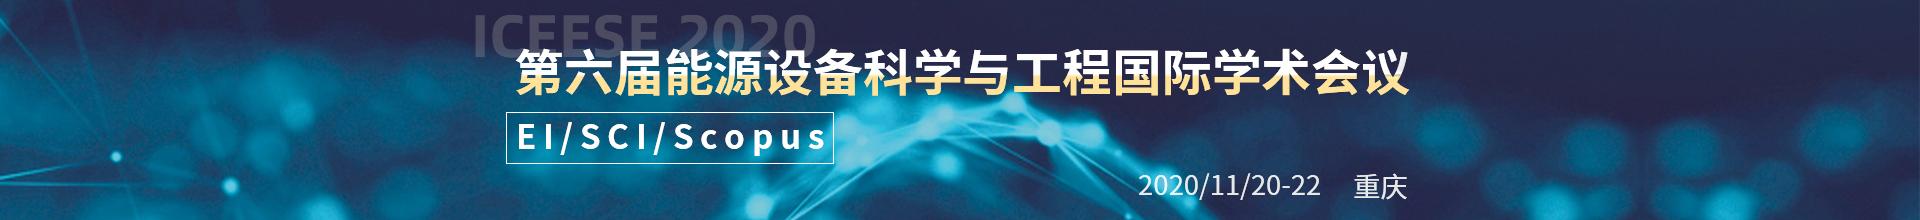 ICEESE 2020学术会议-丘嘉明-0609.jpg